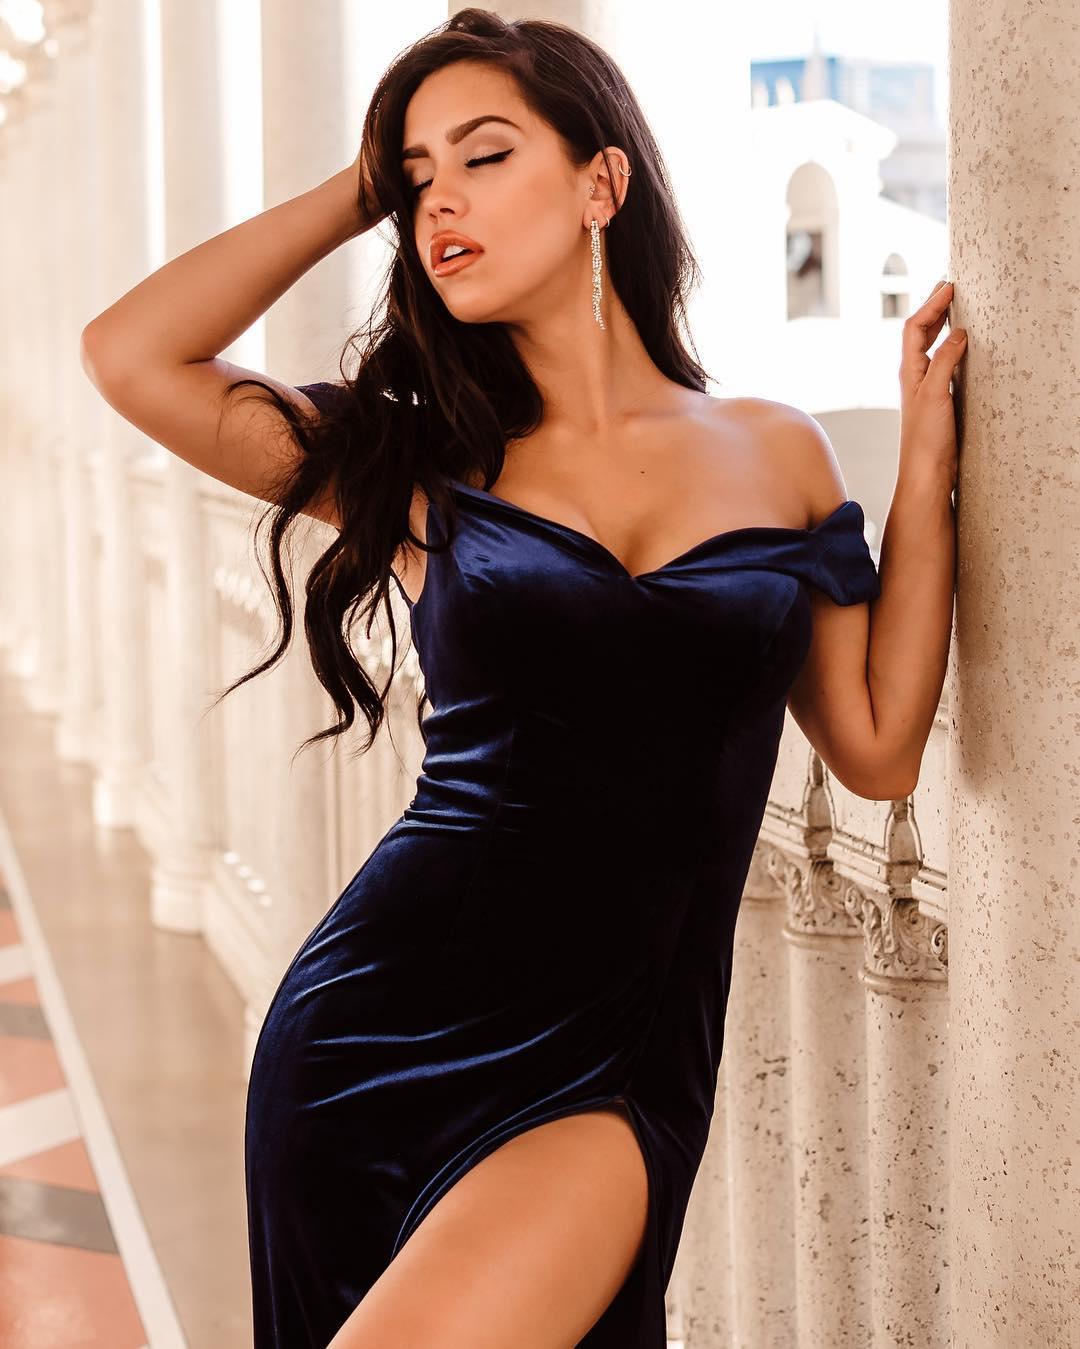 Alina-Lopez-Wallpapers-Insta-Fit-Bio-3